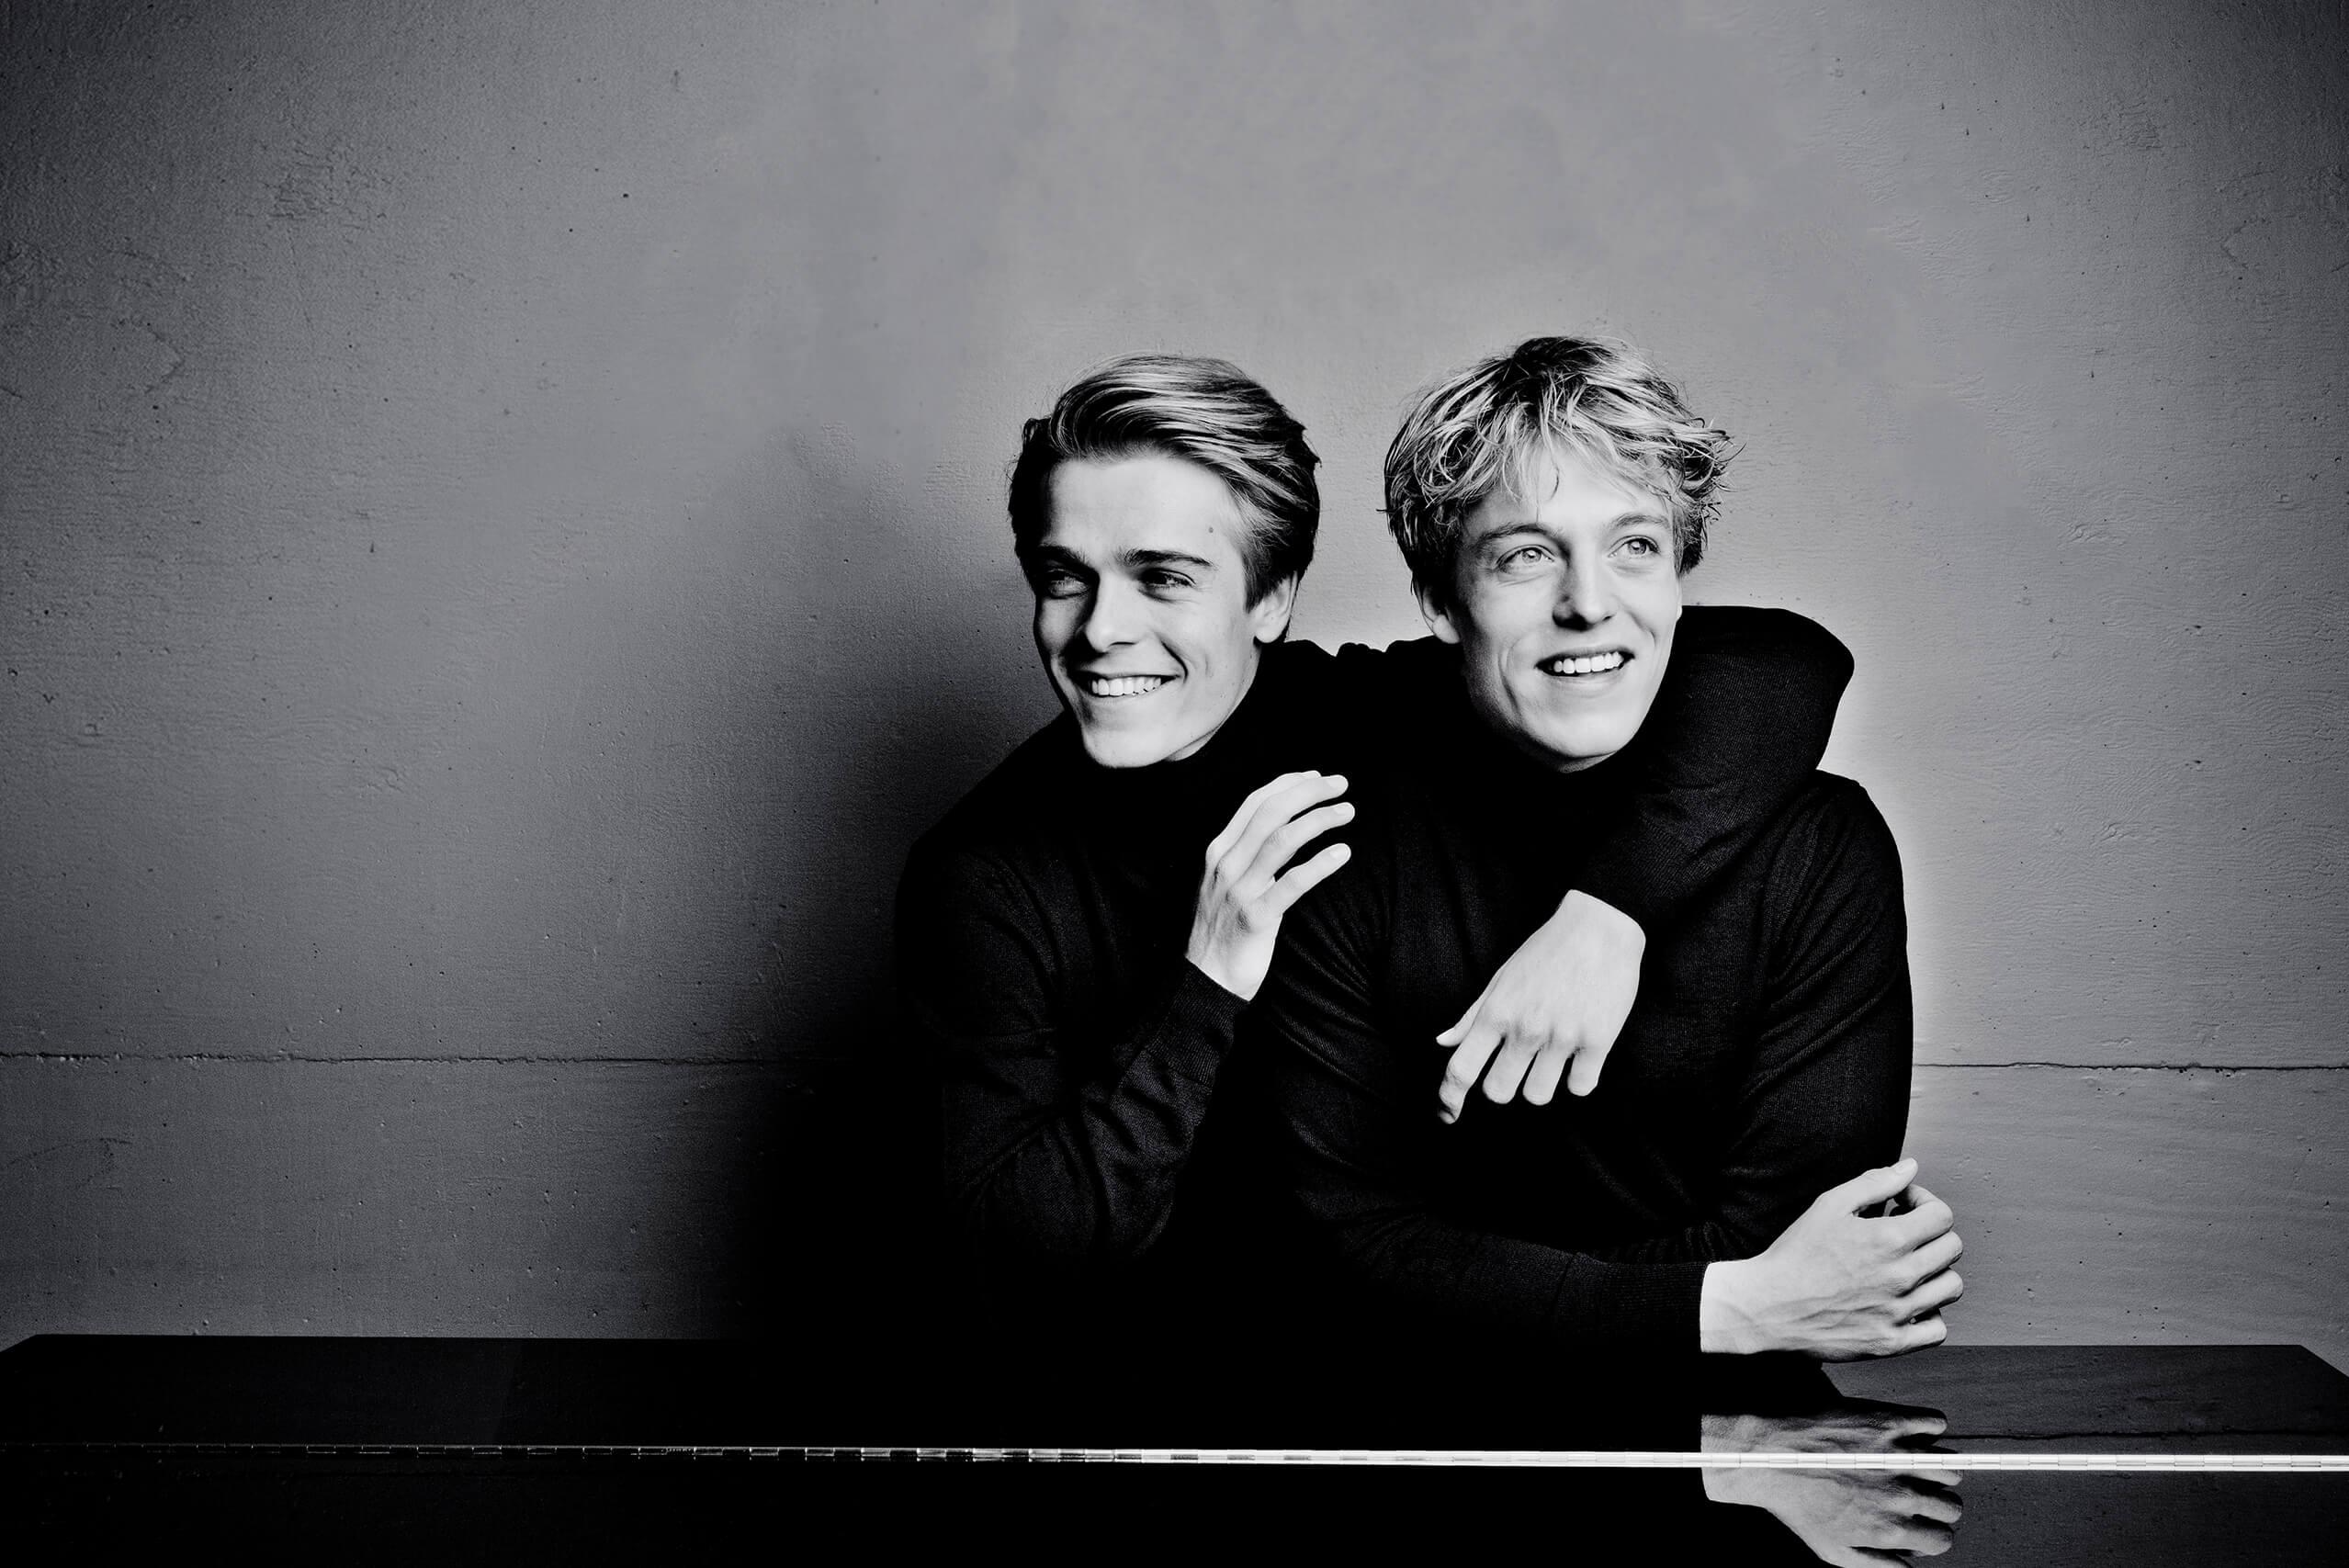 Lucas & Arthur